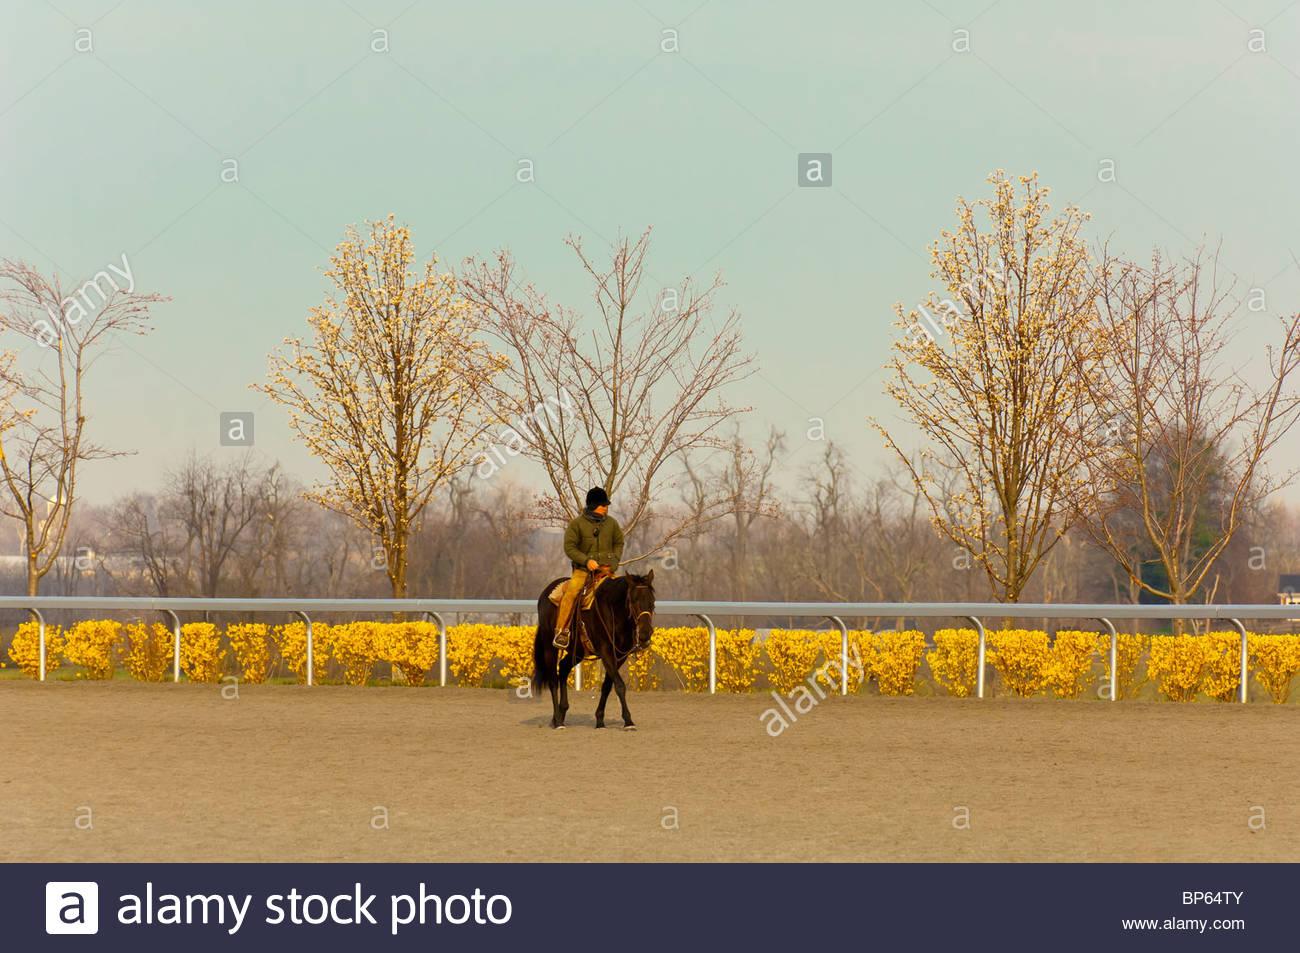 Morning workouts, Keeneland Race Course, Lexington, Kentucky USA - Stock Image